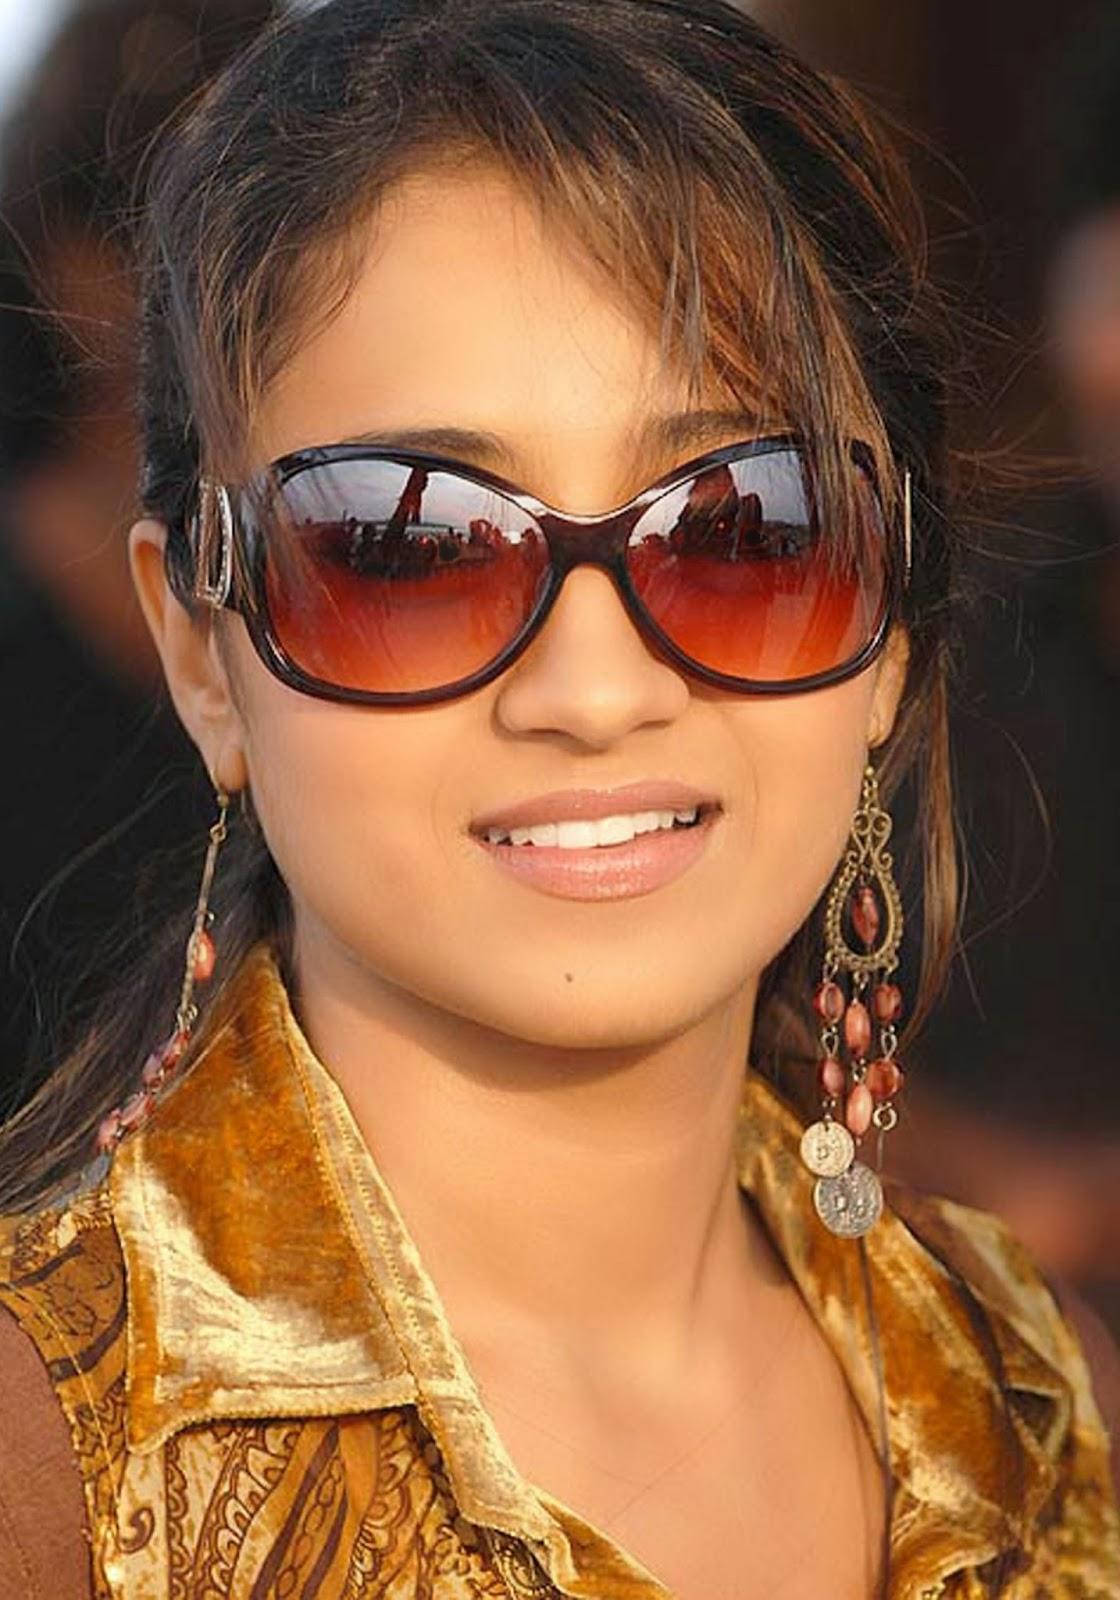 Bollywood actress blowjob gif